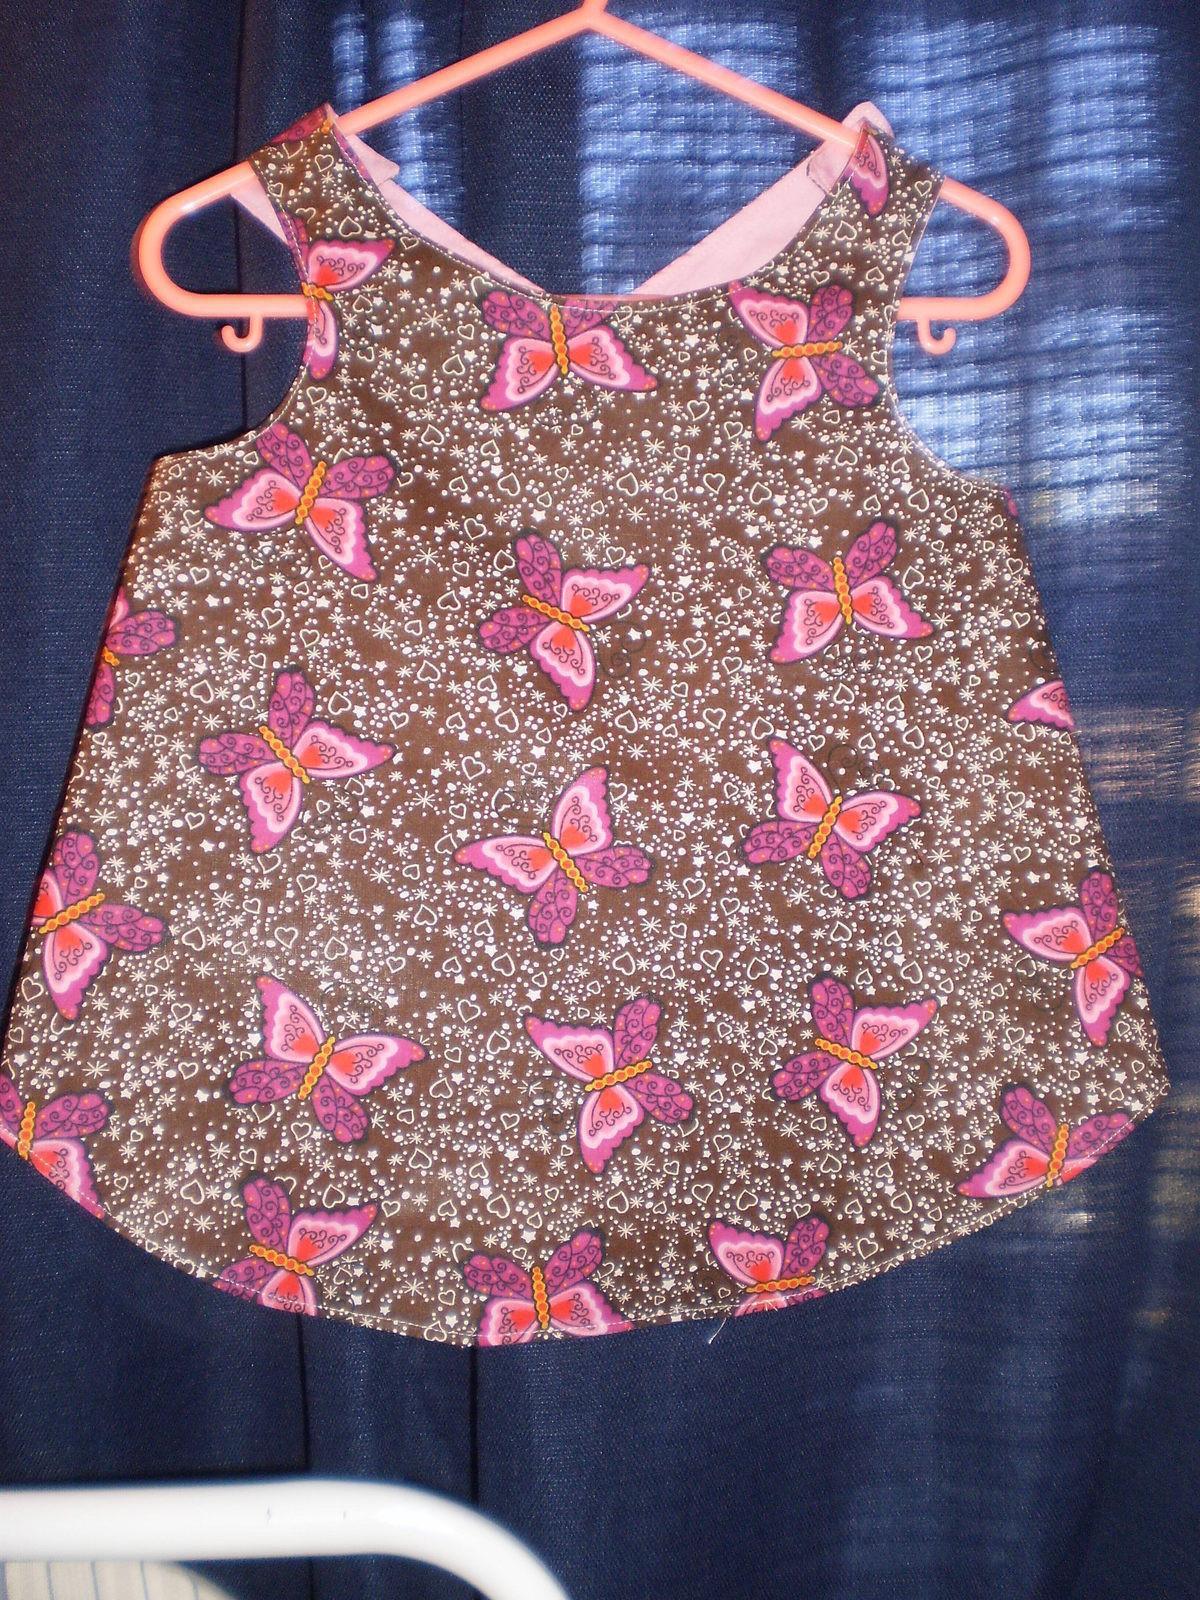 Babys Apron Dress  A Baby Dress  Dressmaking on Cut Out